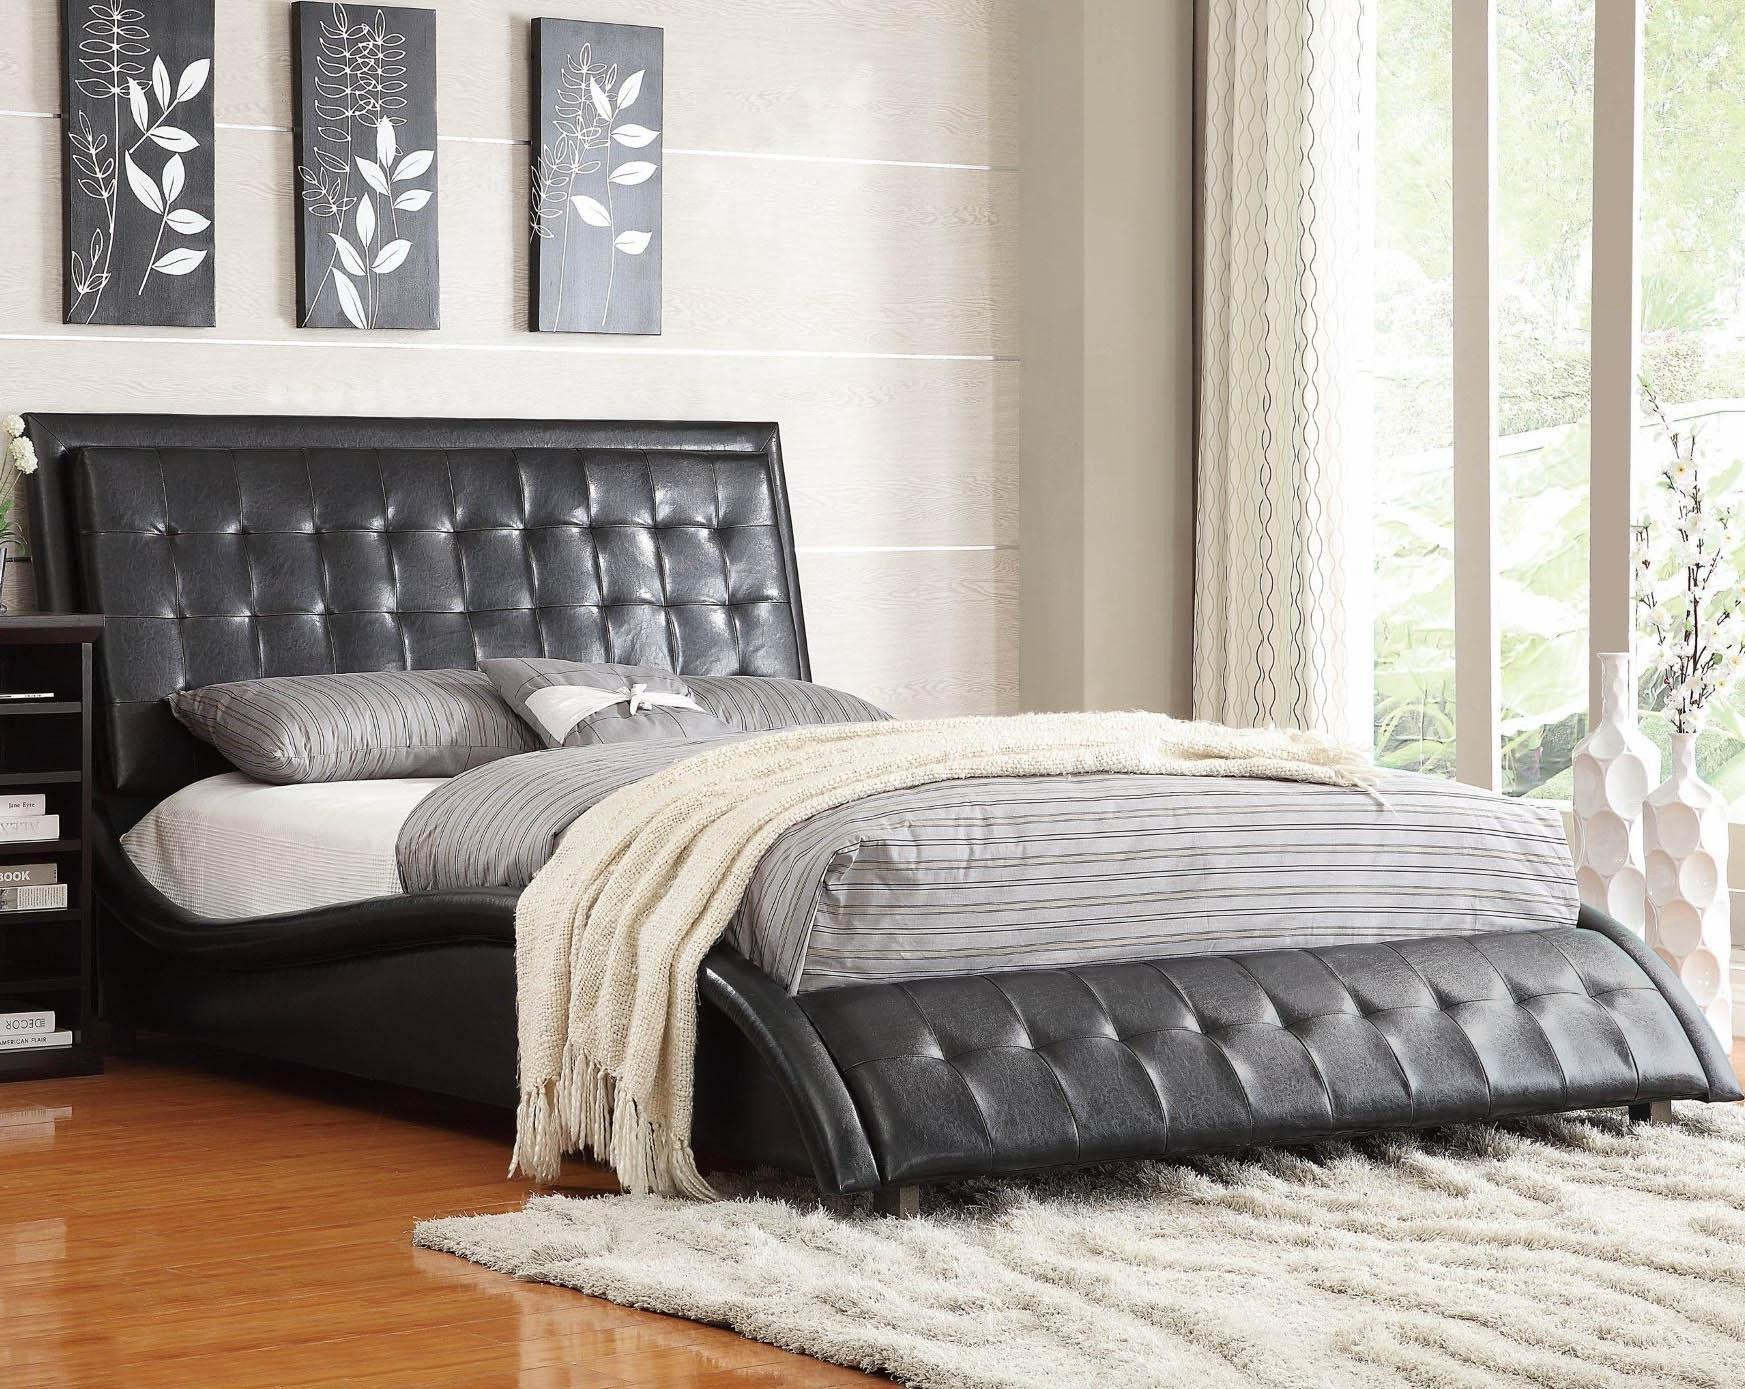 Tufted Headboard Bedroom Set Luxury Tully Black Upholstered Bed